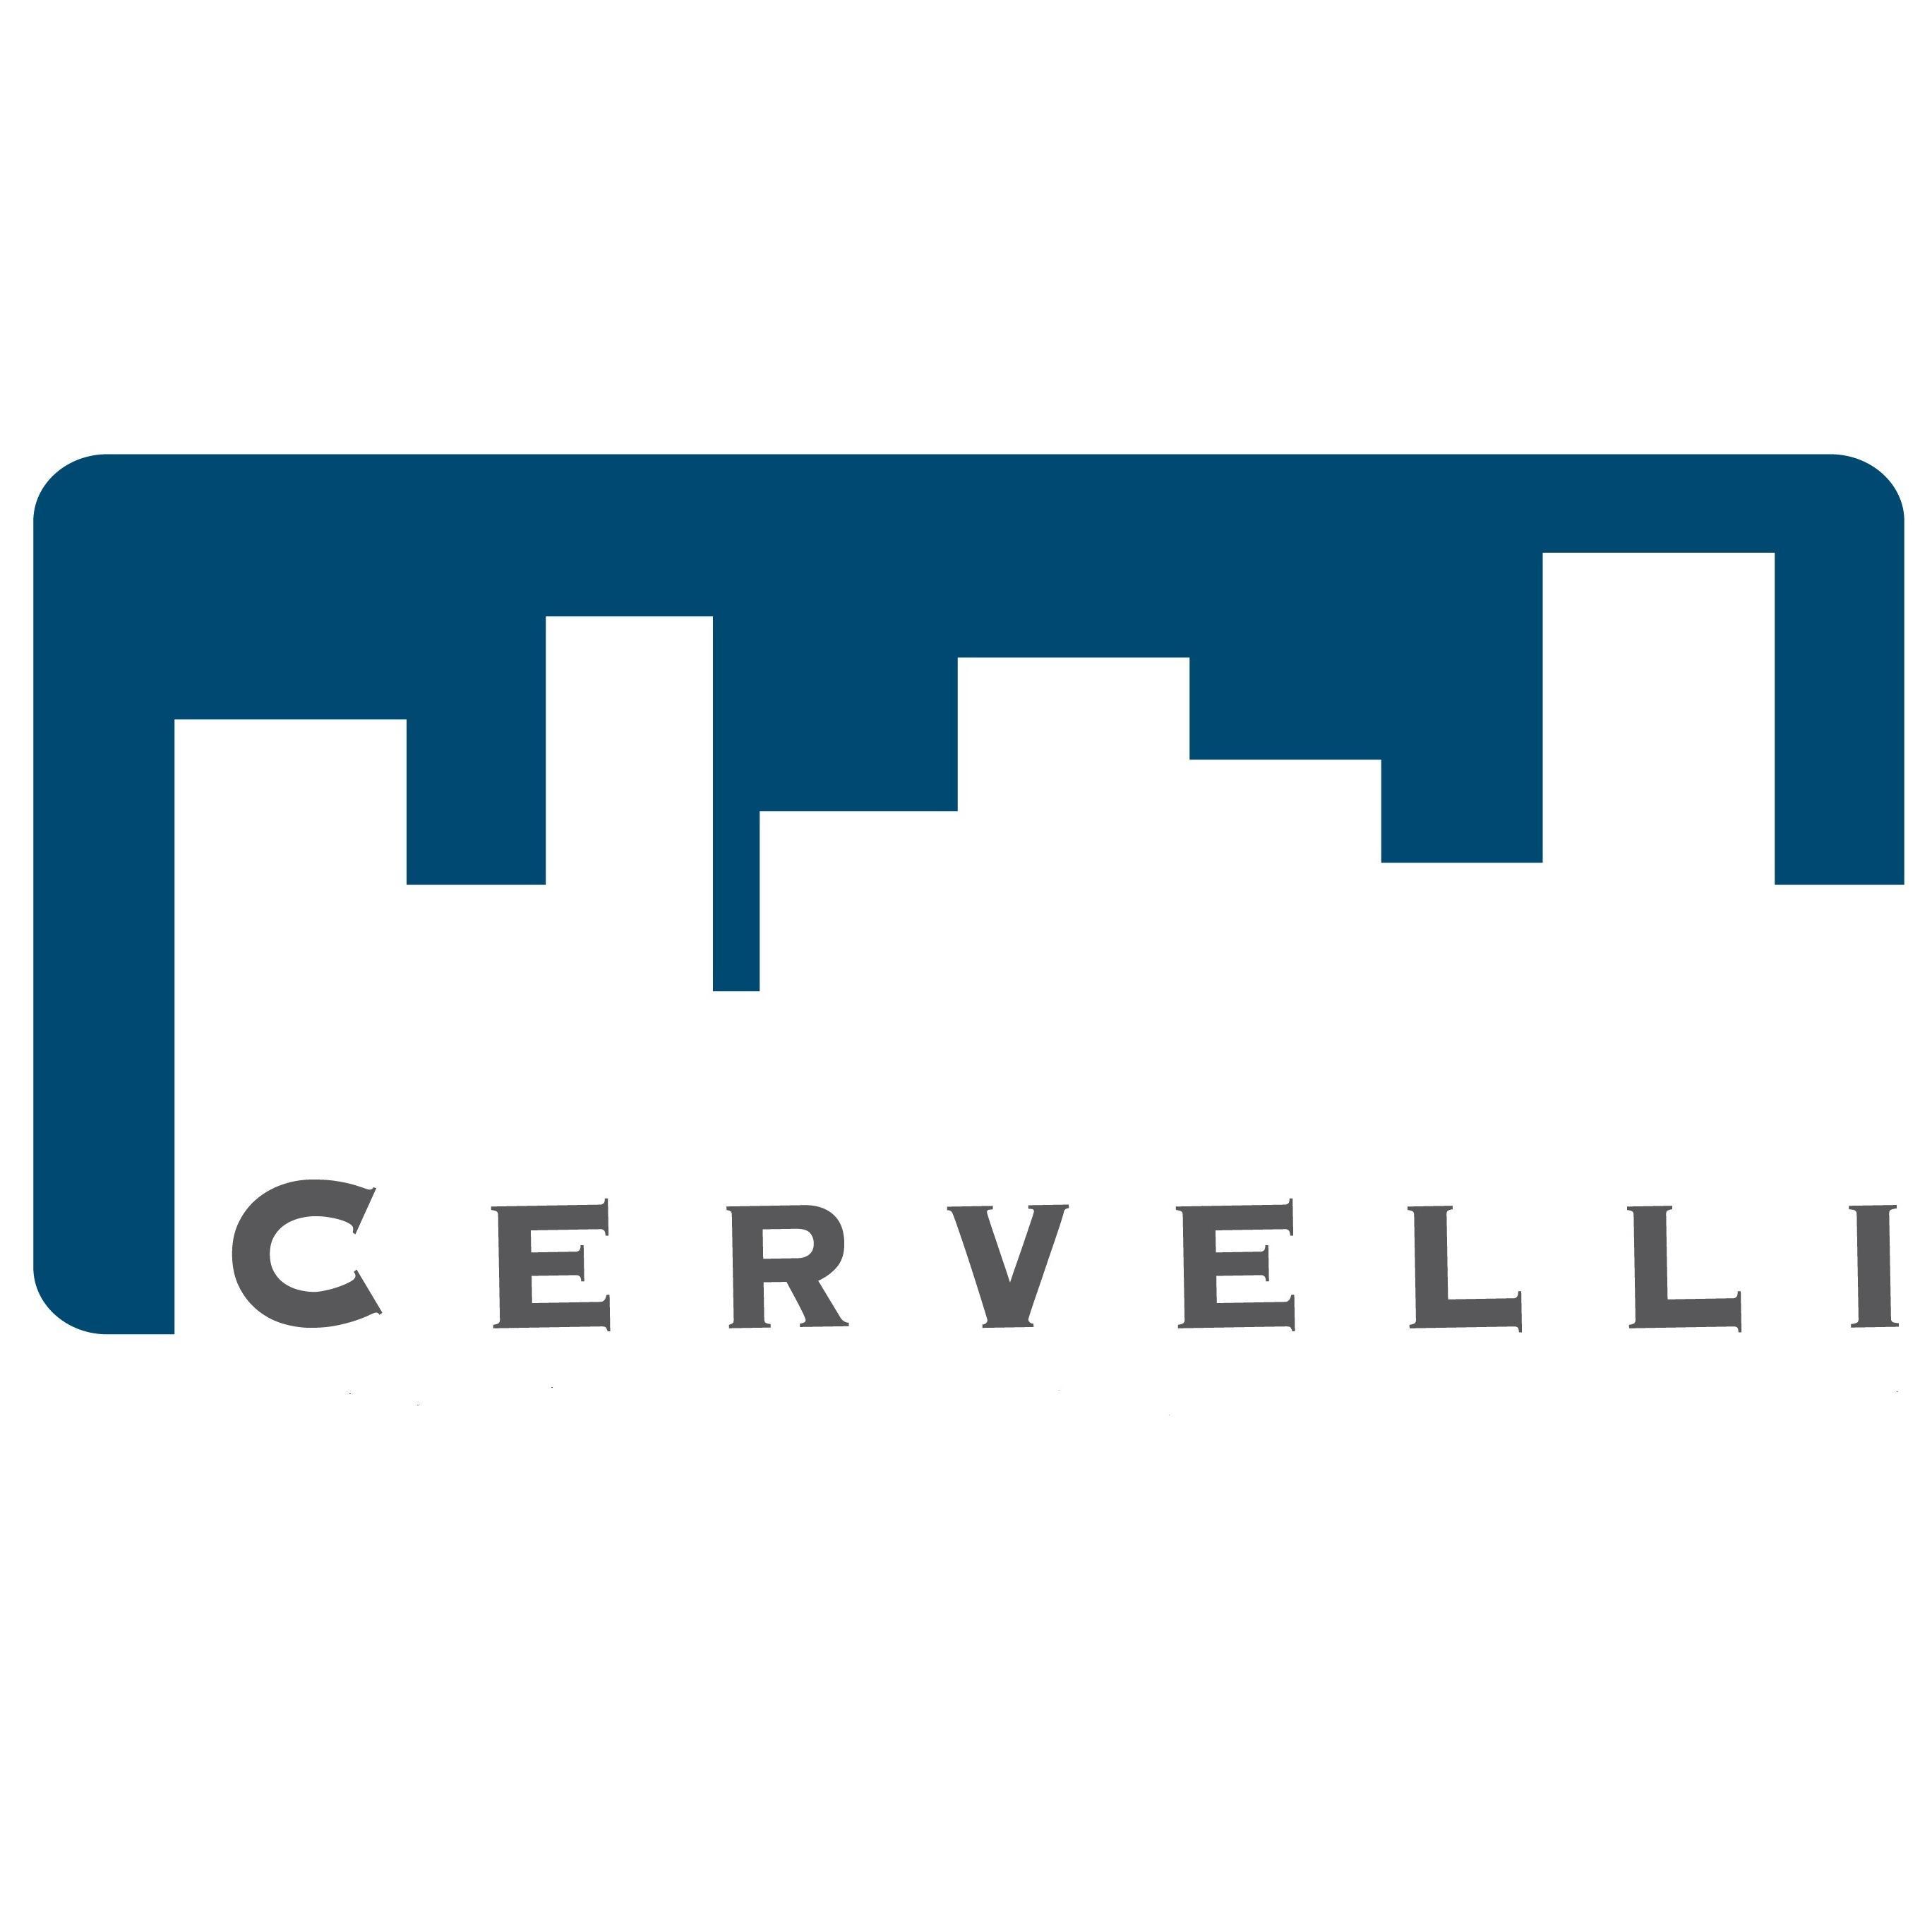 Cervelli Real Estate and Property Management Corp - North Bergen, NJ 07047 - (201)868-6300 | ShowMeLocal.com